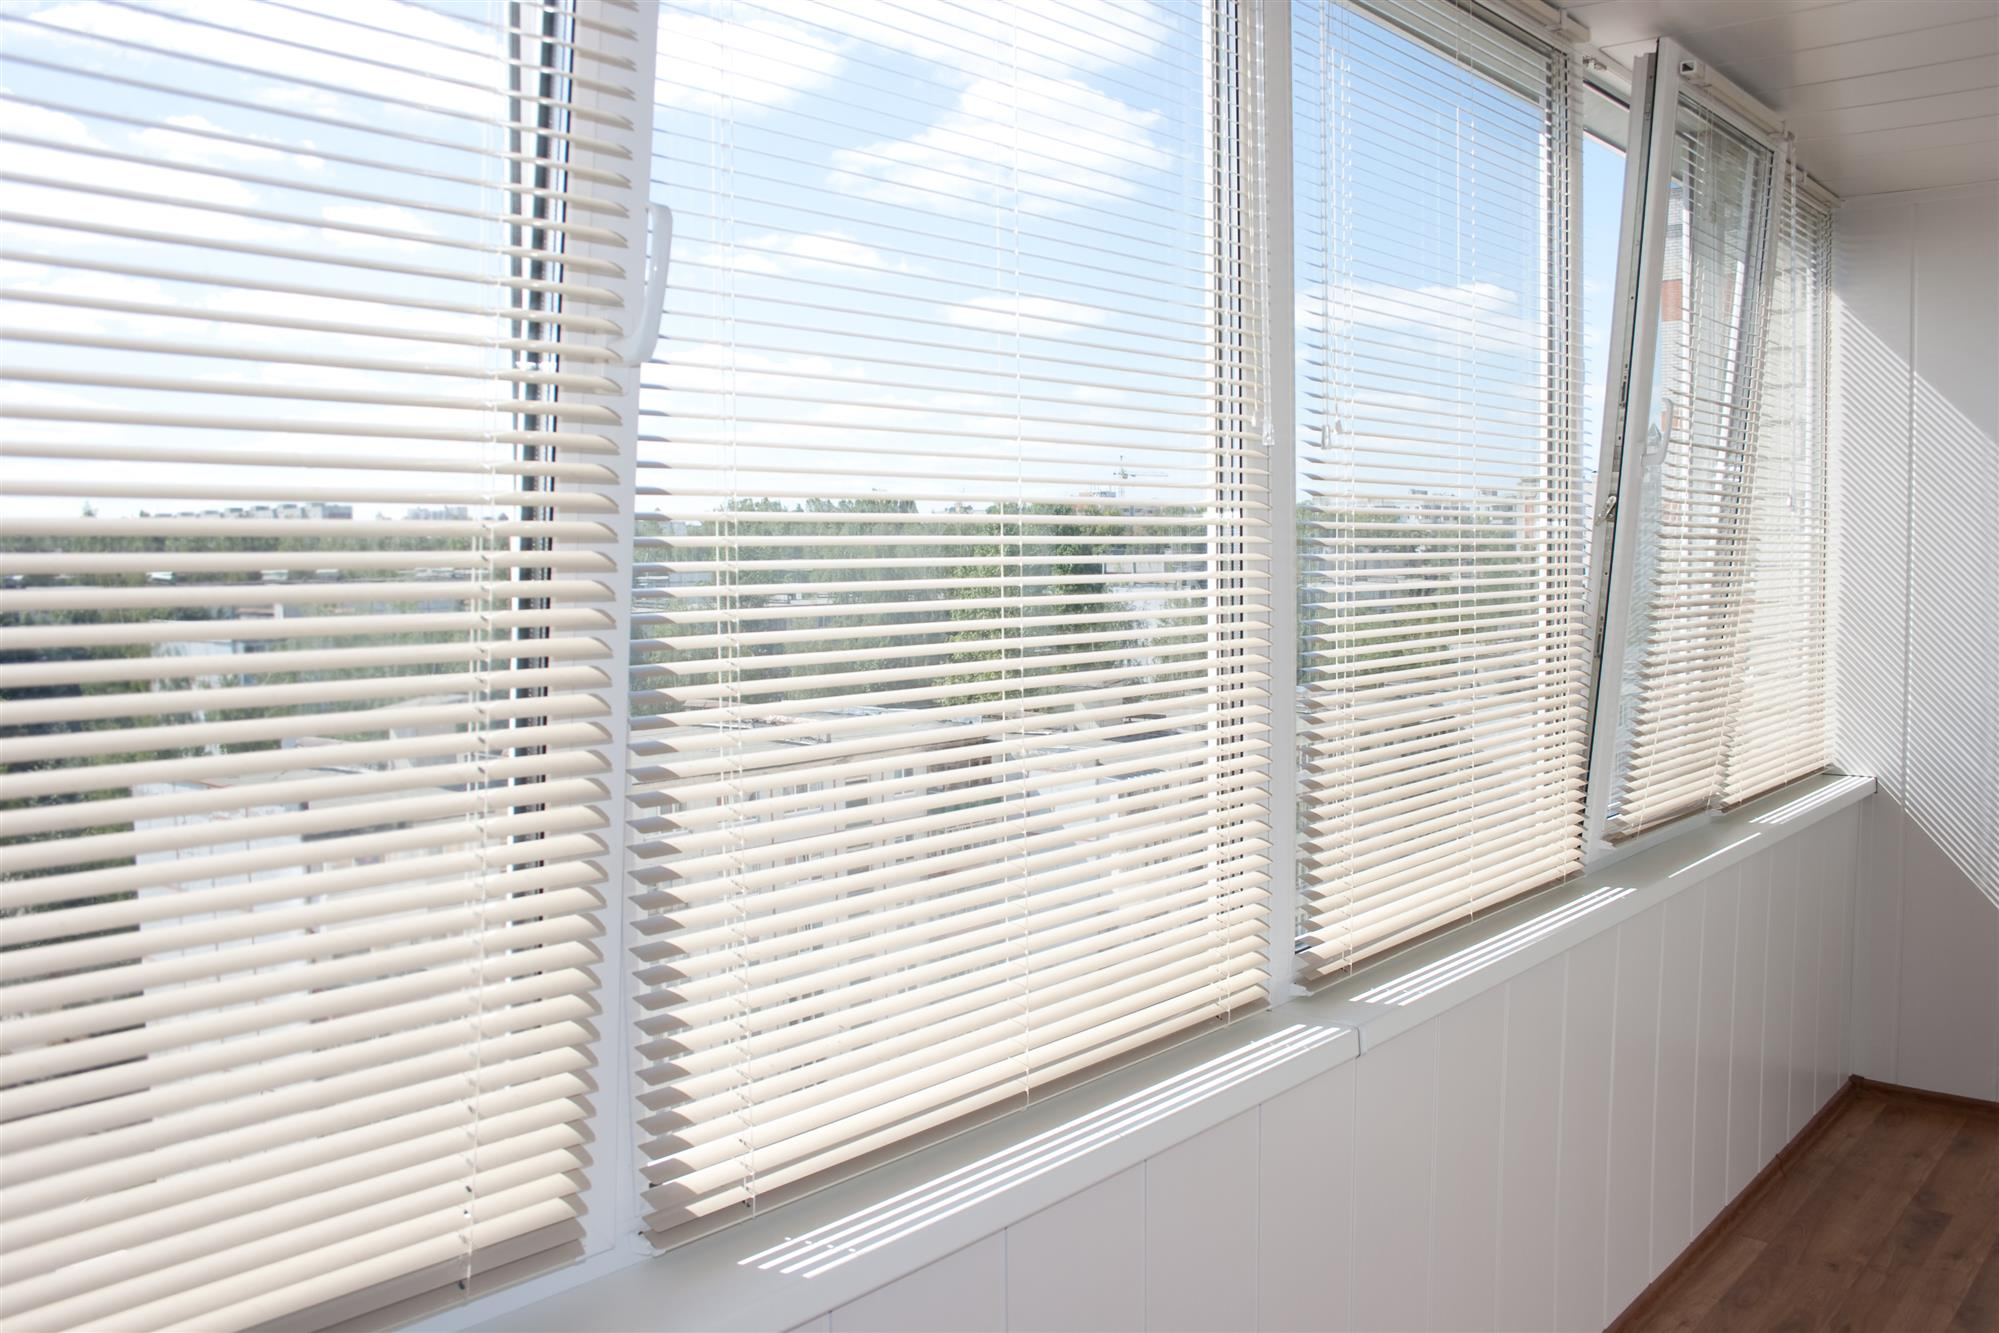 window blind cleaning ultrasonic cleaning blind cleaner novi window treatments blind cleaning repair near novi aria onsite